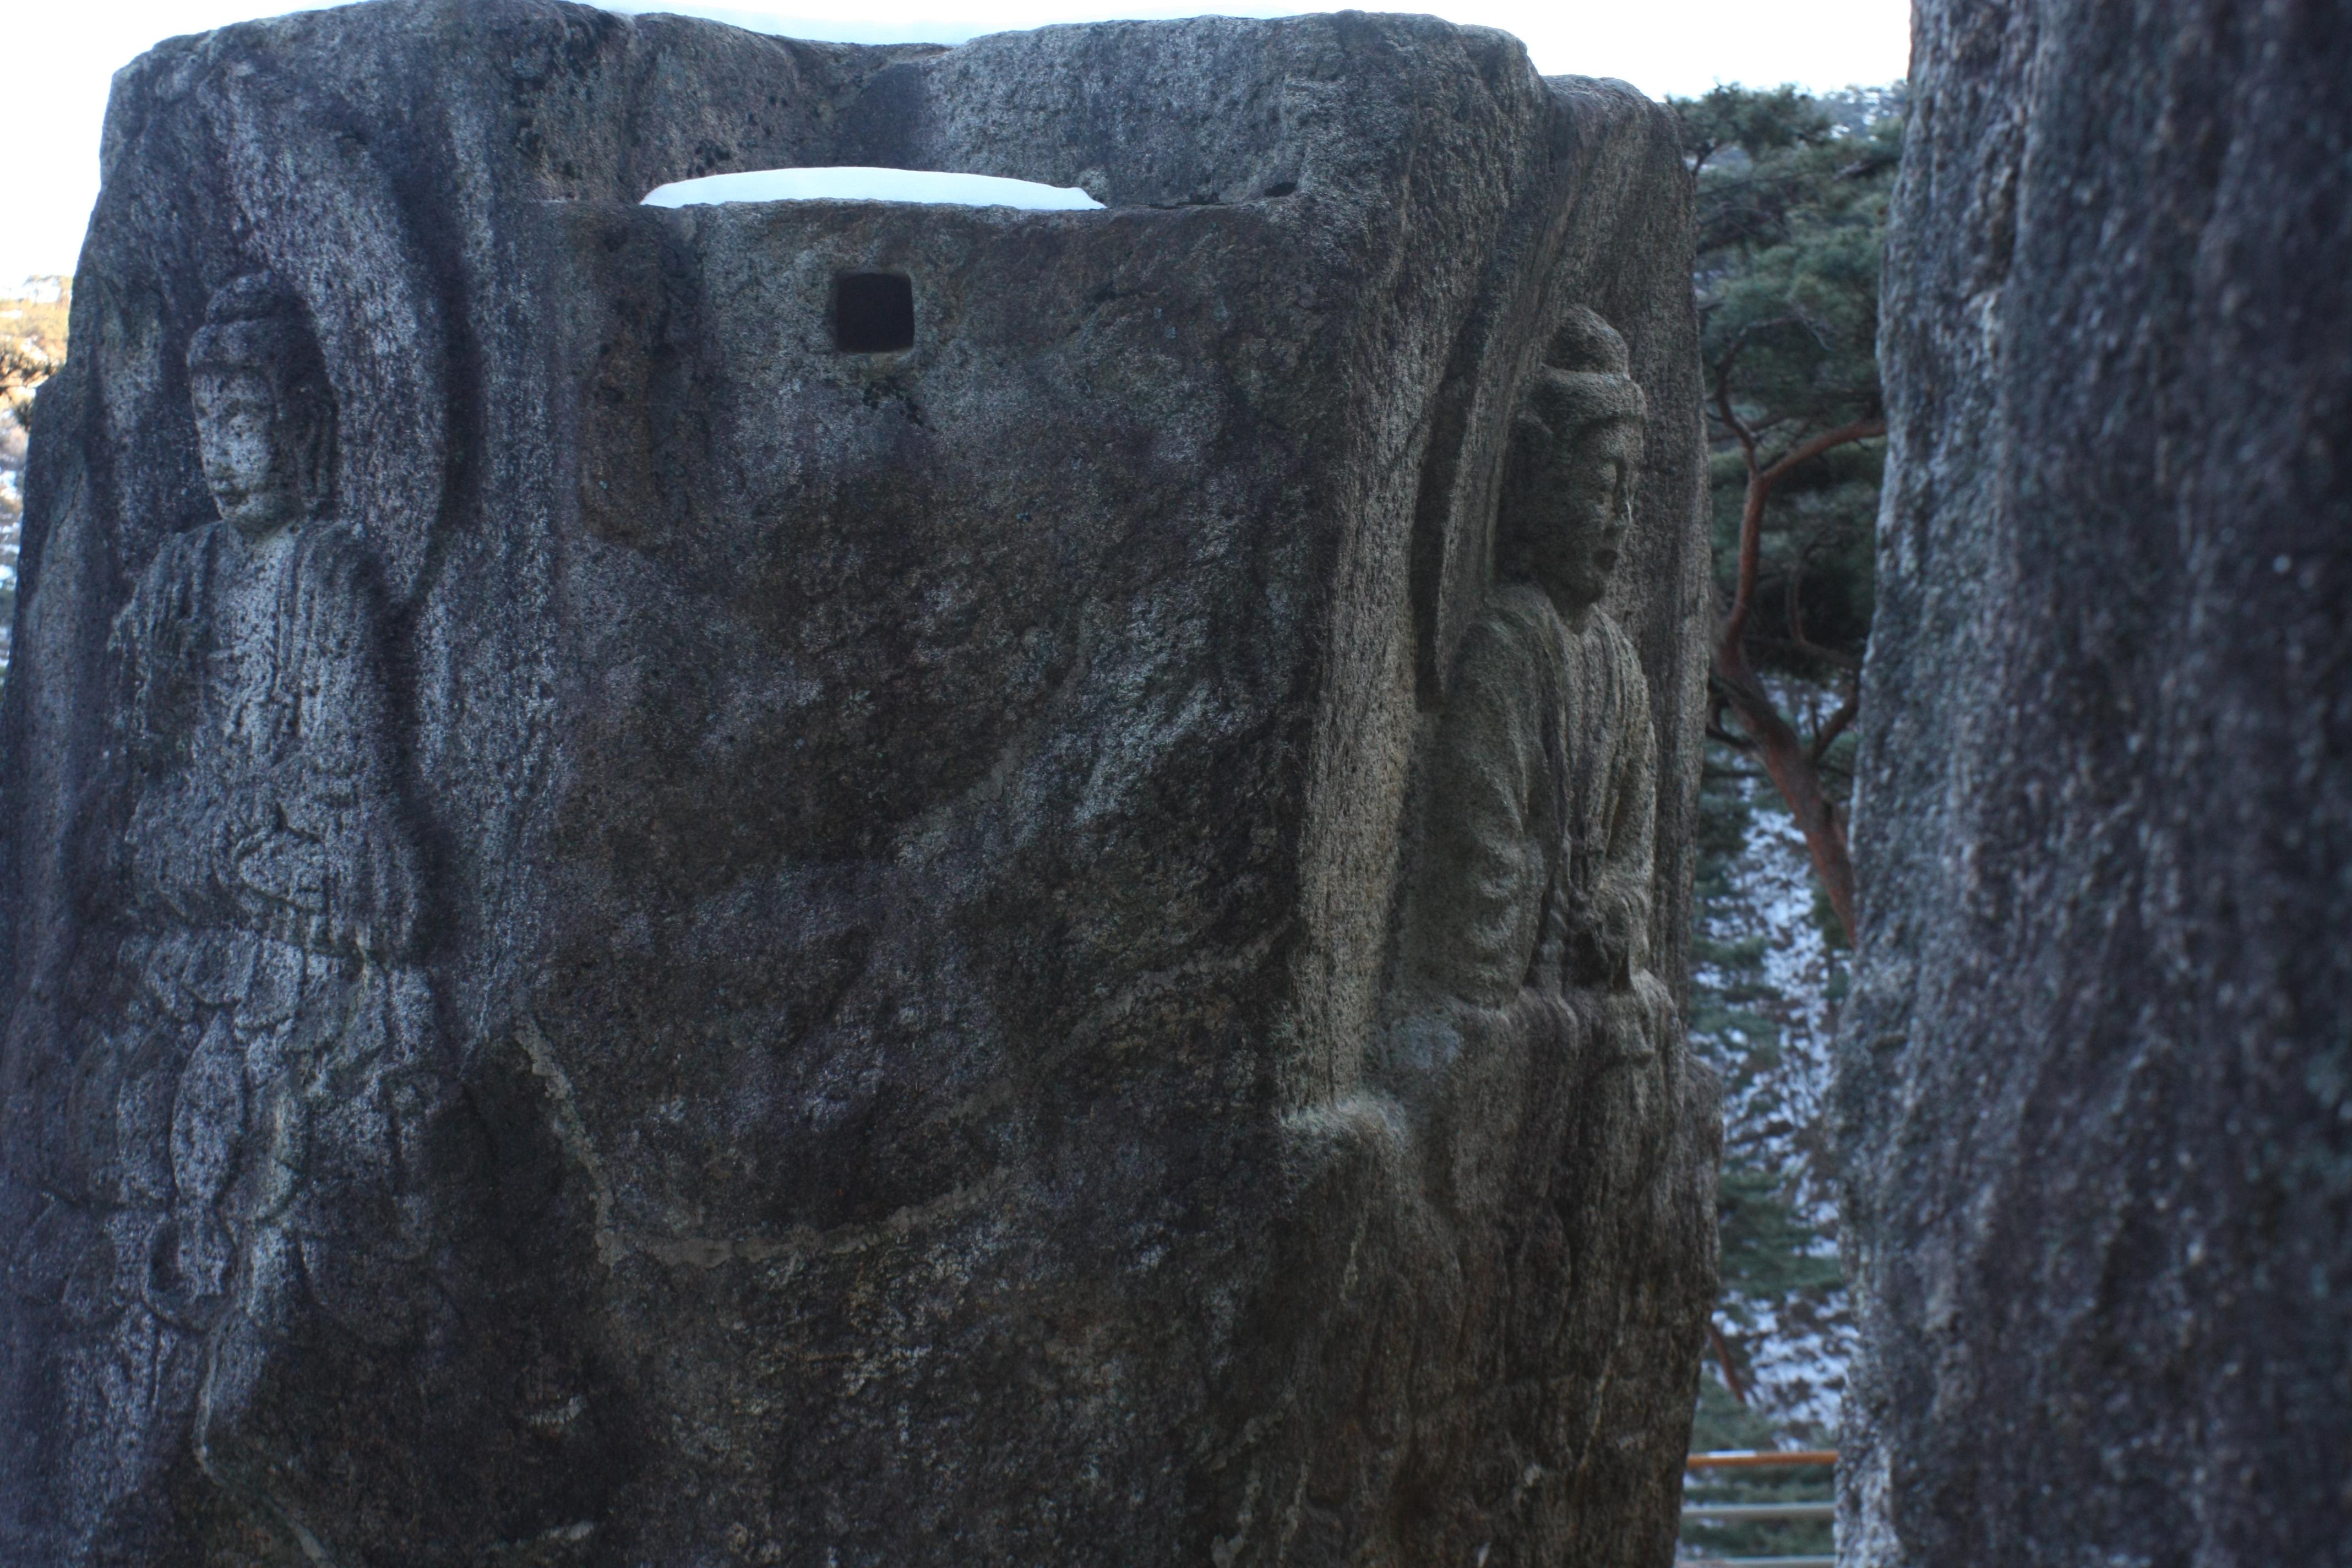 Touring Namsan the fascinating south mountain of Gyeongju